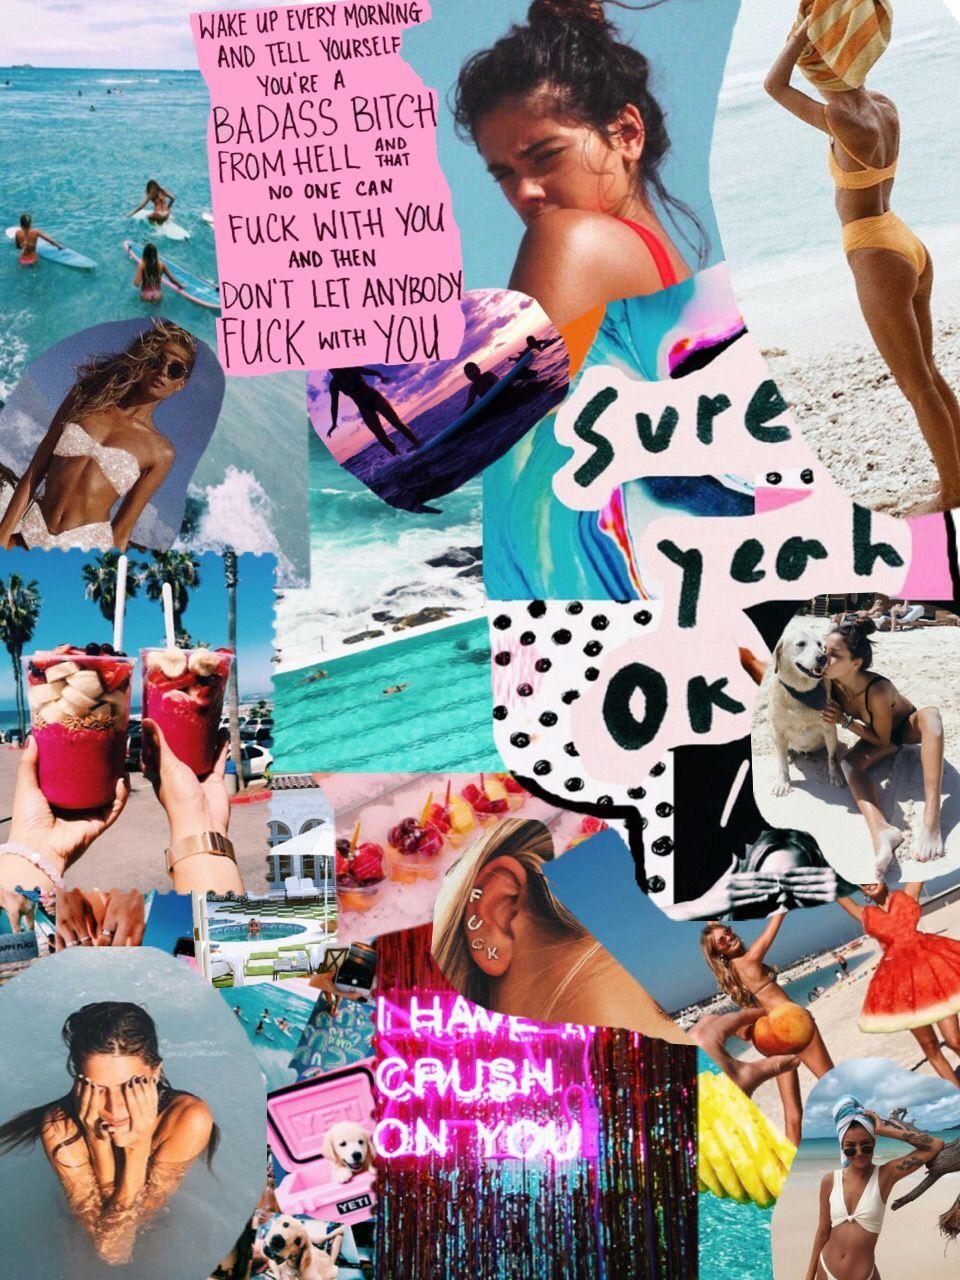 mariaherediacolaco aesthetic collage